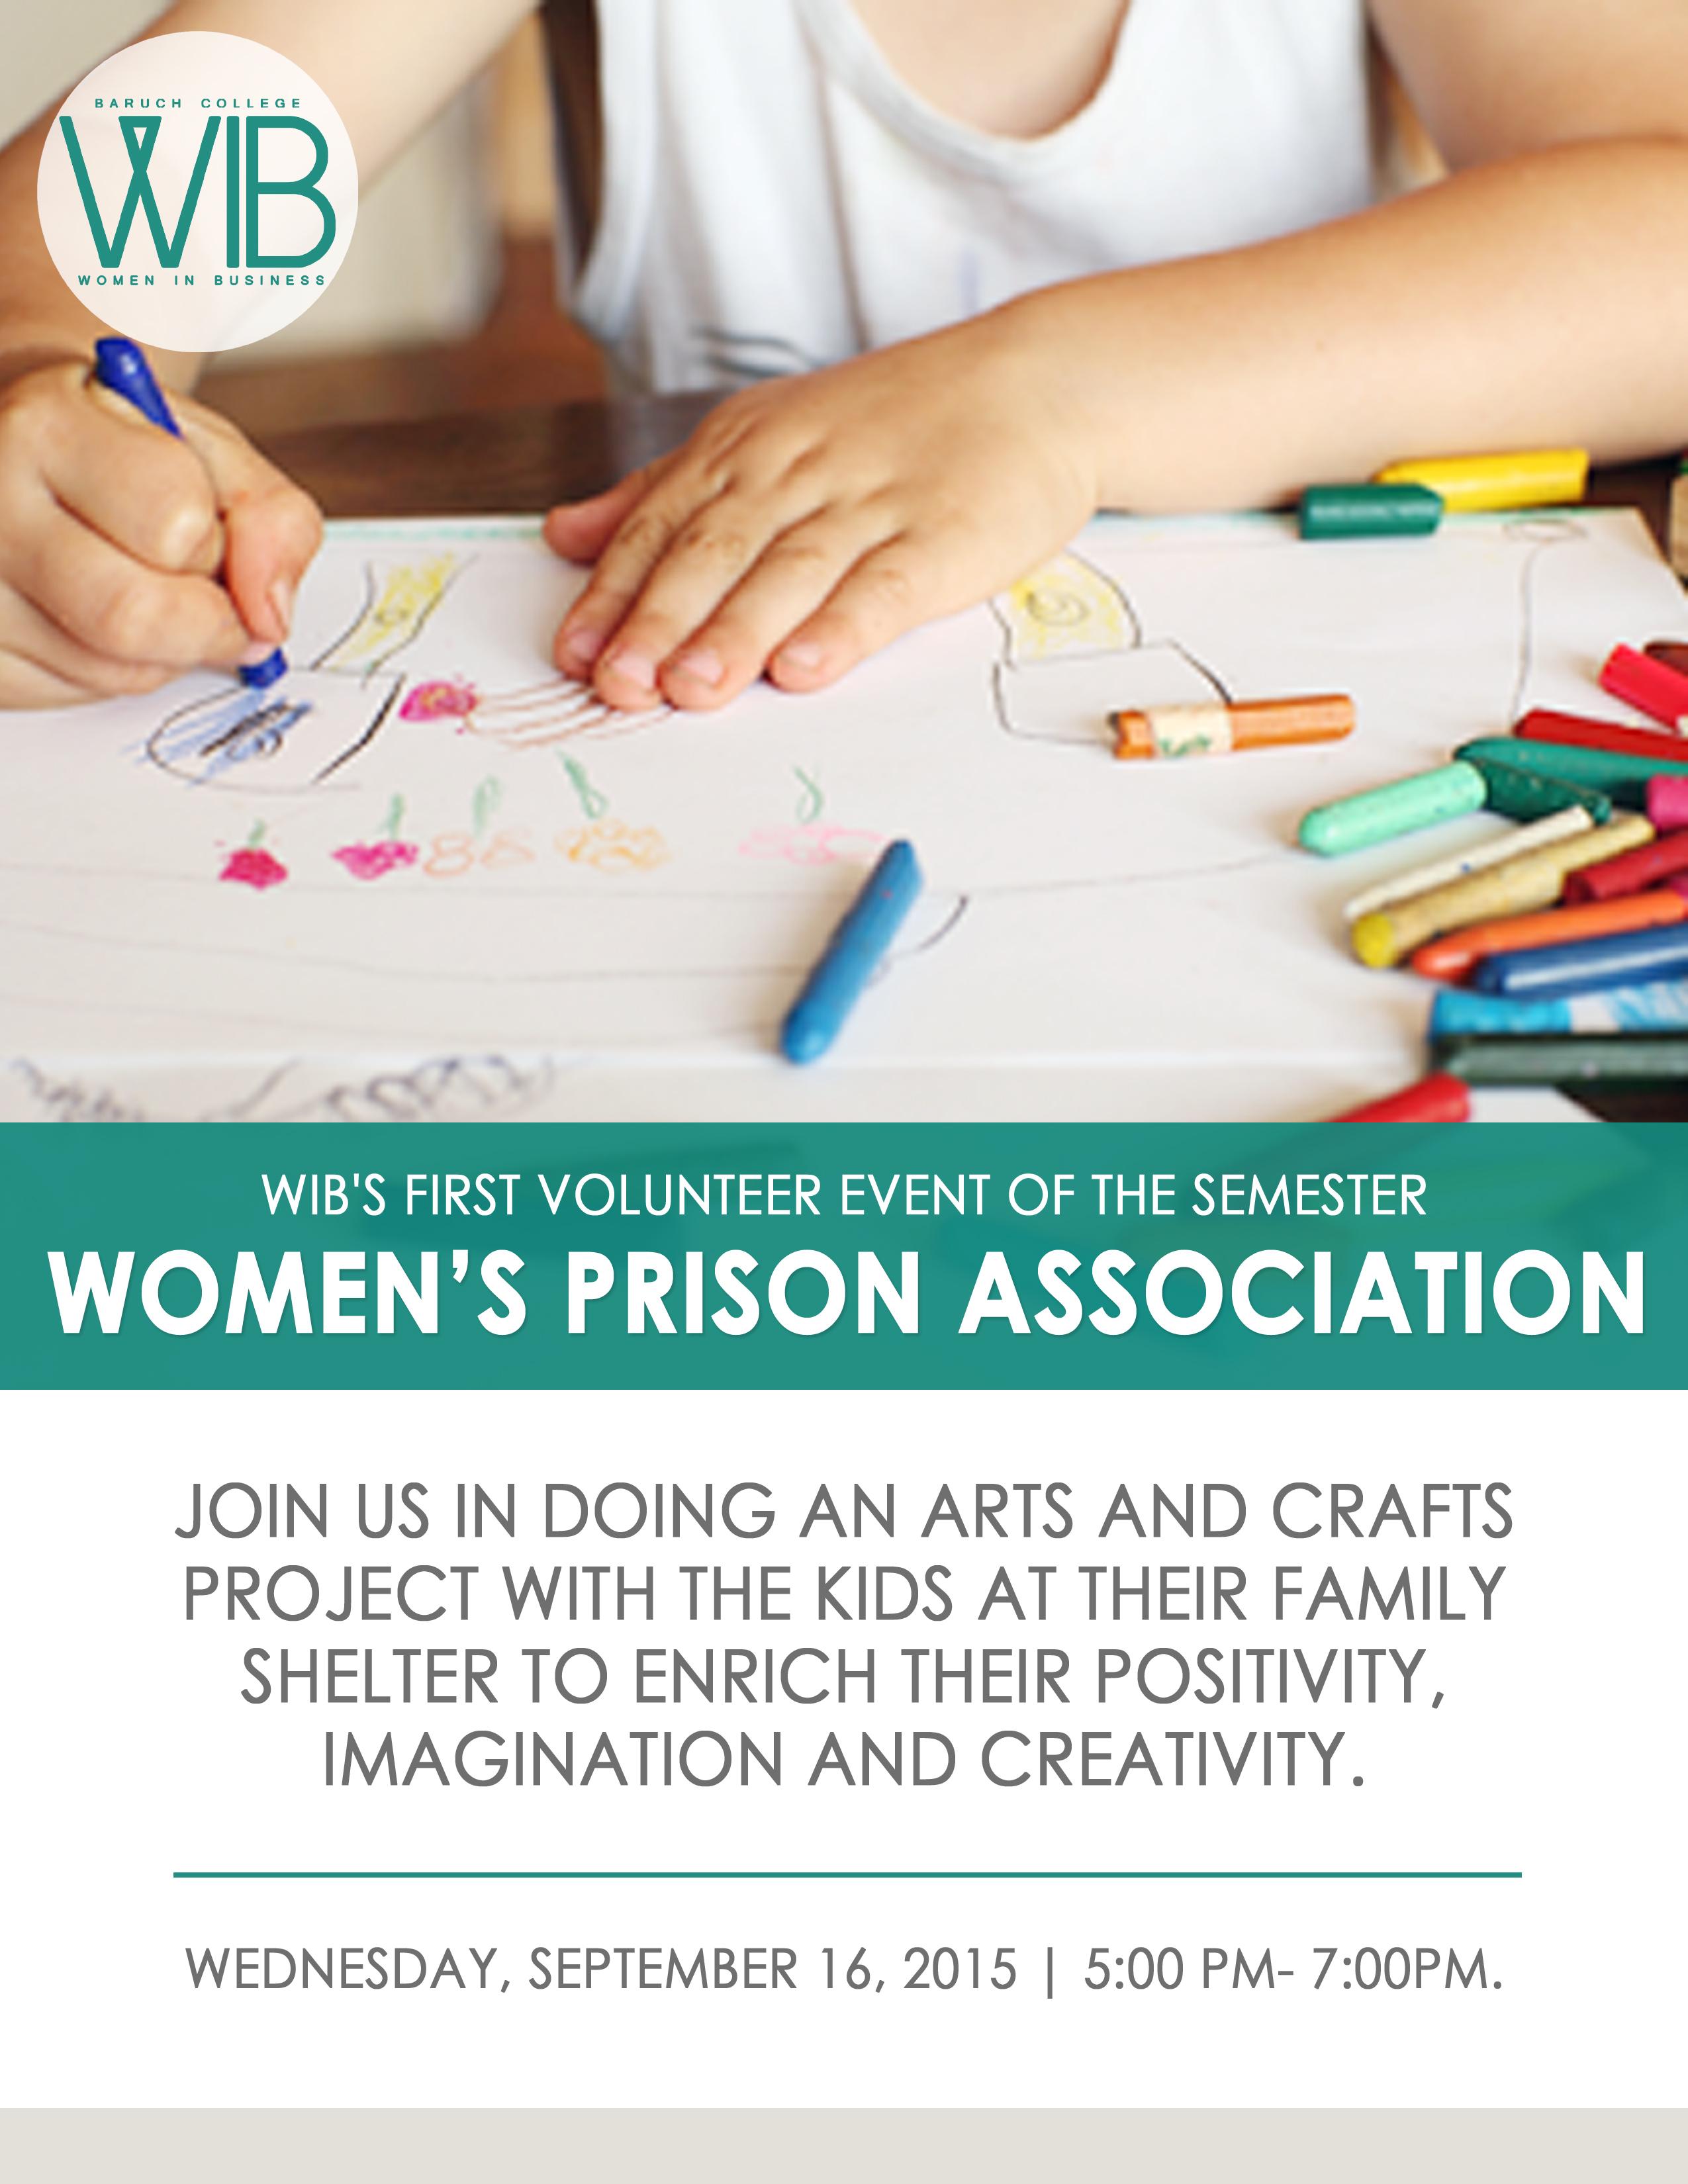 Women's Prison Association